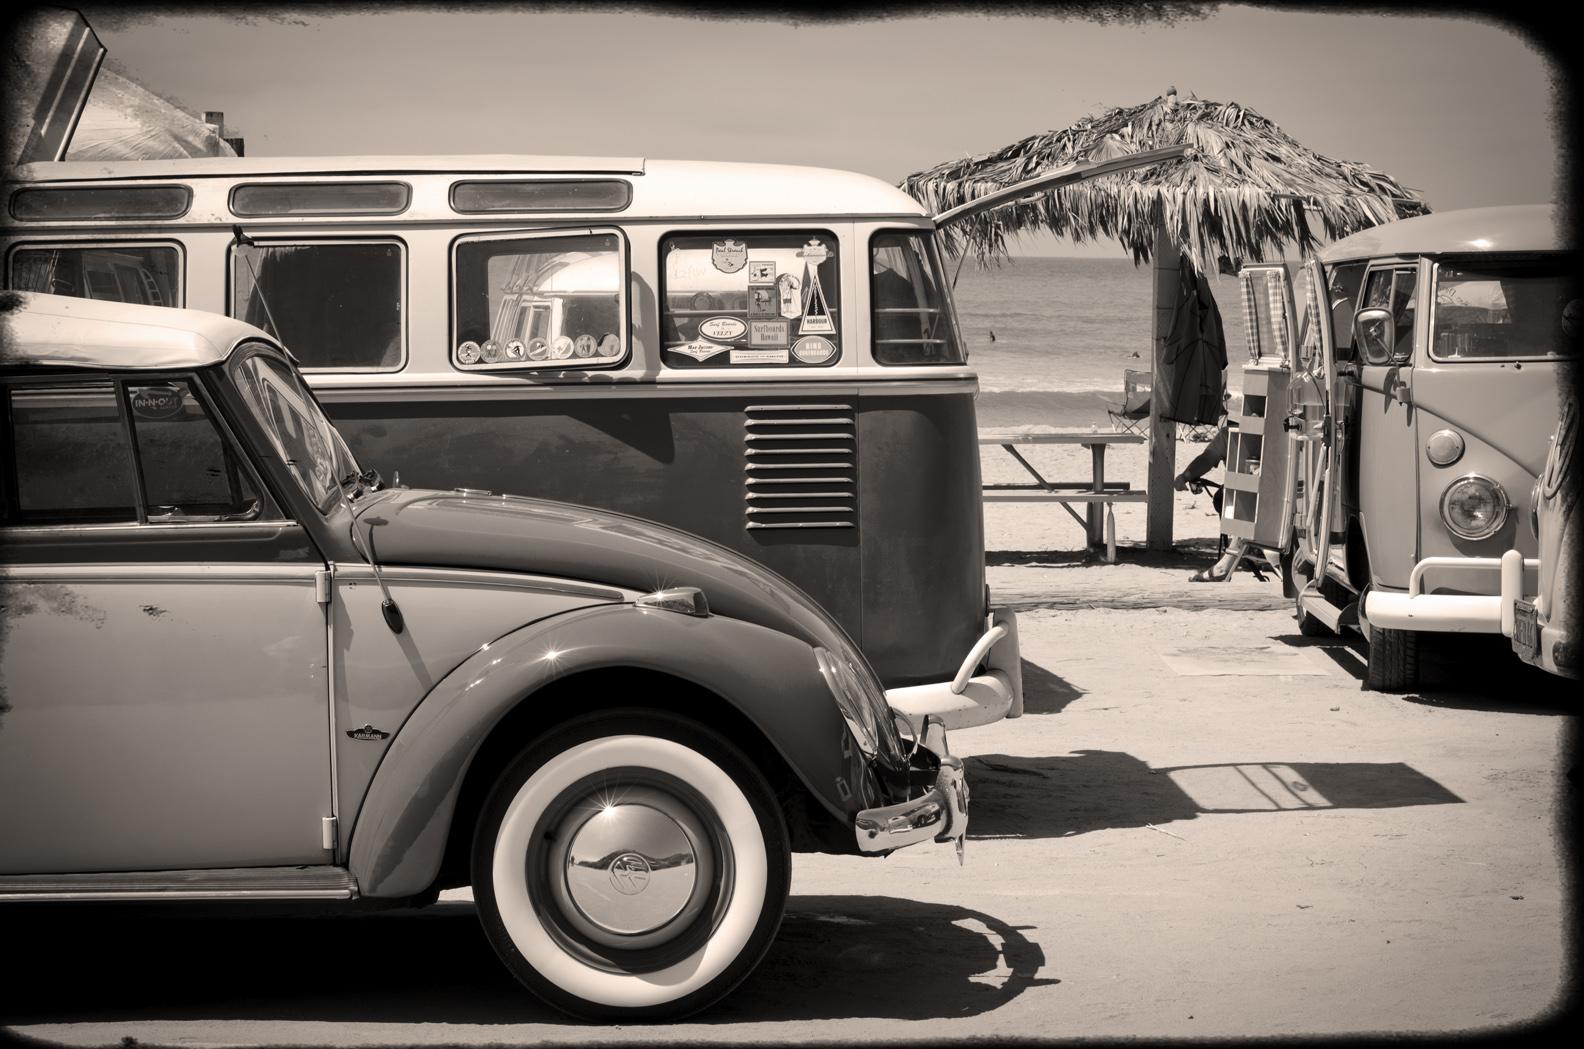 big wednesday san onofre beach timm eubanks. Black Bedroom Furniture Sets. Home Design Ideas